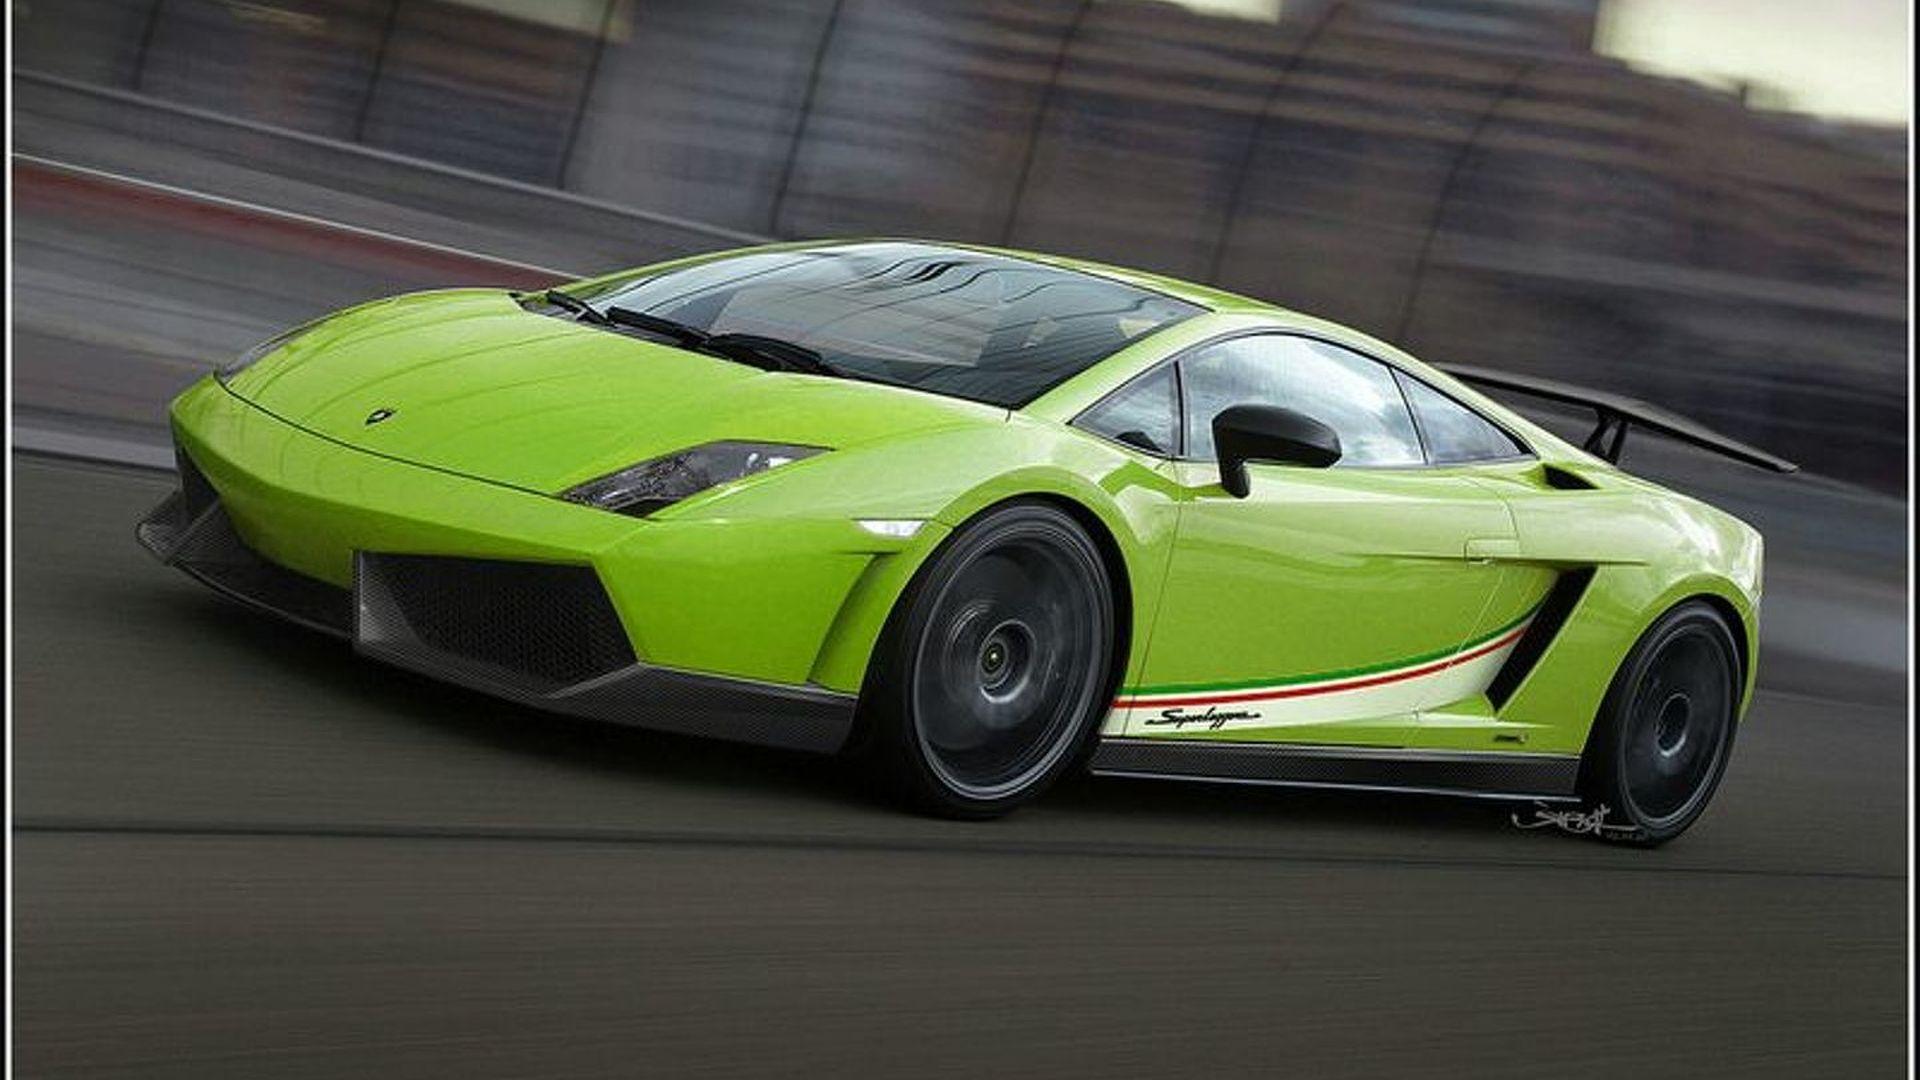 Lamborghini Gallardo LP570 4 Superleggera Further Details And Renderings  Surface